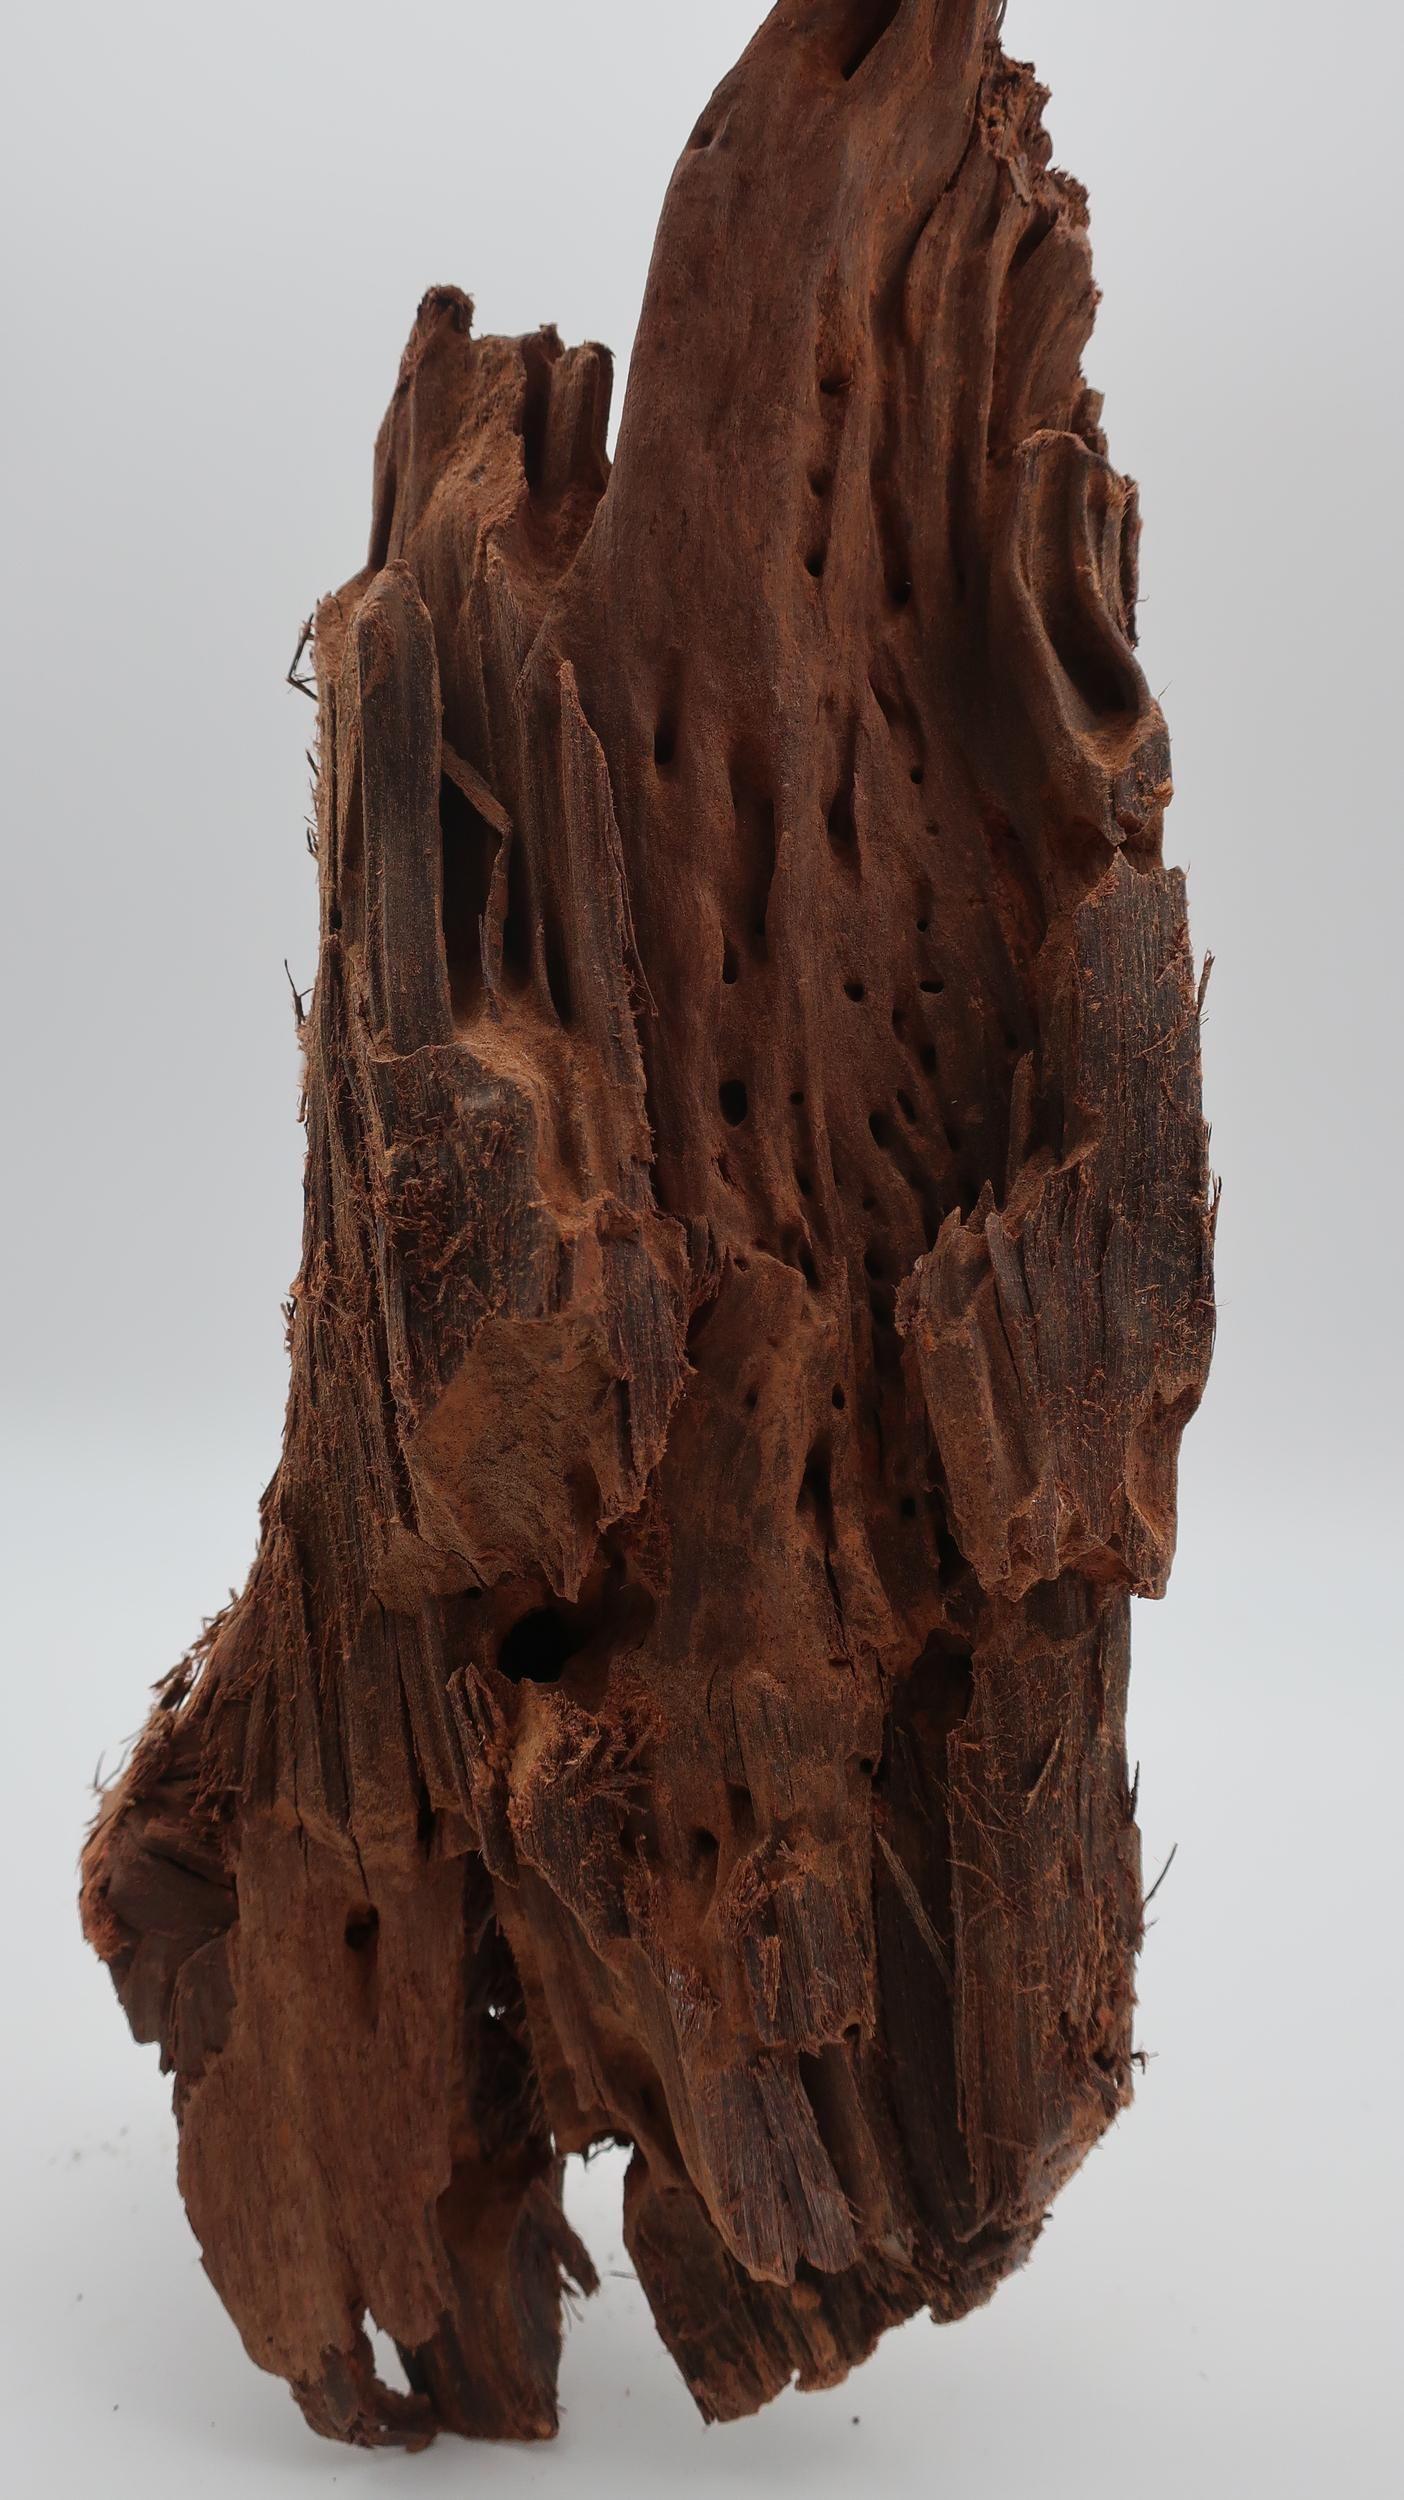 RACINE MANGROVE XL 48-60cm